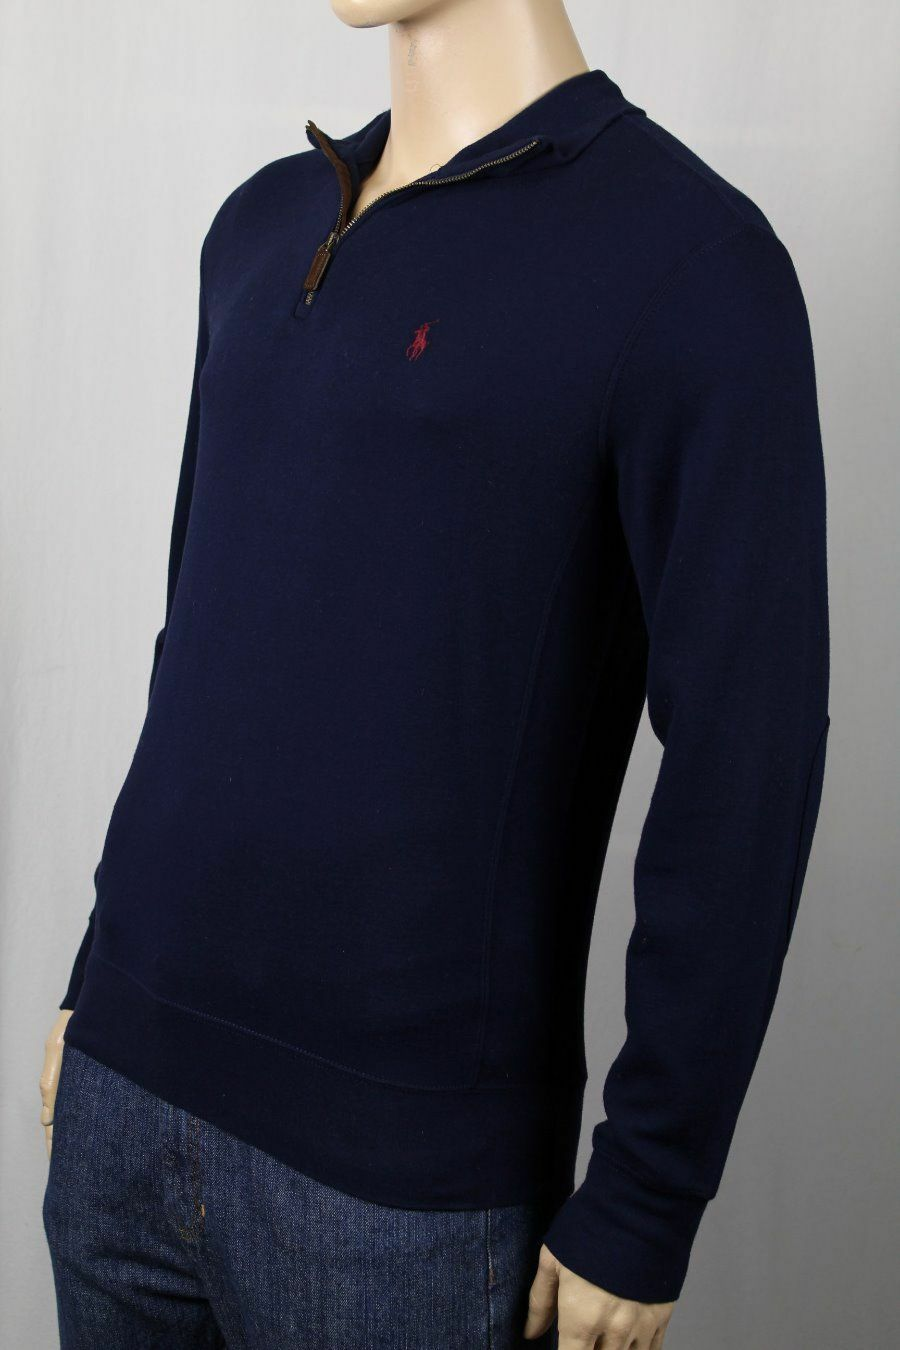 Polo Ralph Lauren Navy 1 2 Lightweight Half Zip Sweater Burgundy Pony NWT  145